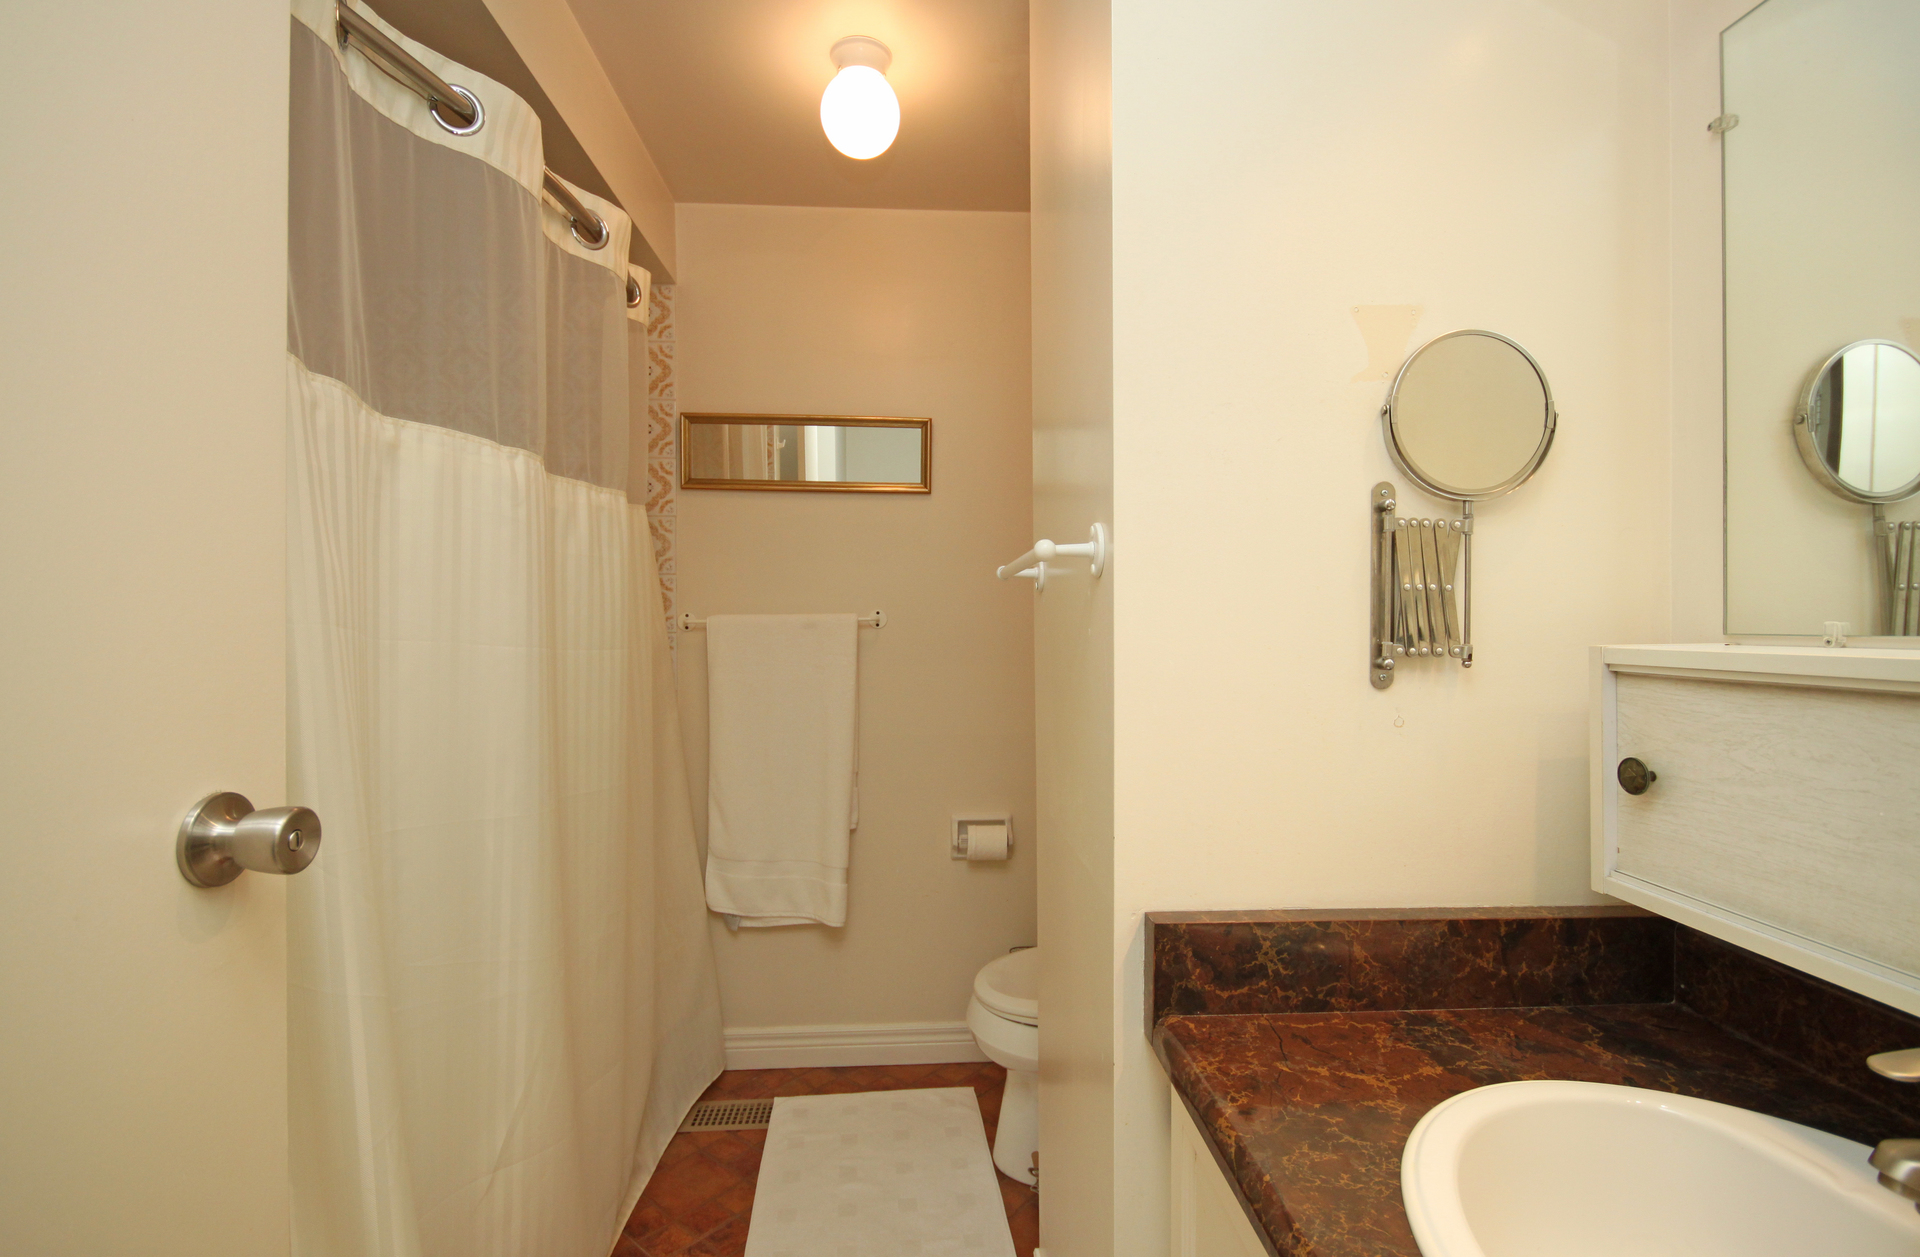 4 Piece Semi-Ensuite Bathroom at 28 Dutch Myrtle Way, Banbury-Don Mills, Toronto